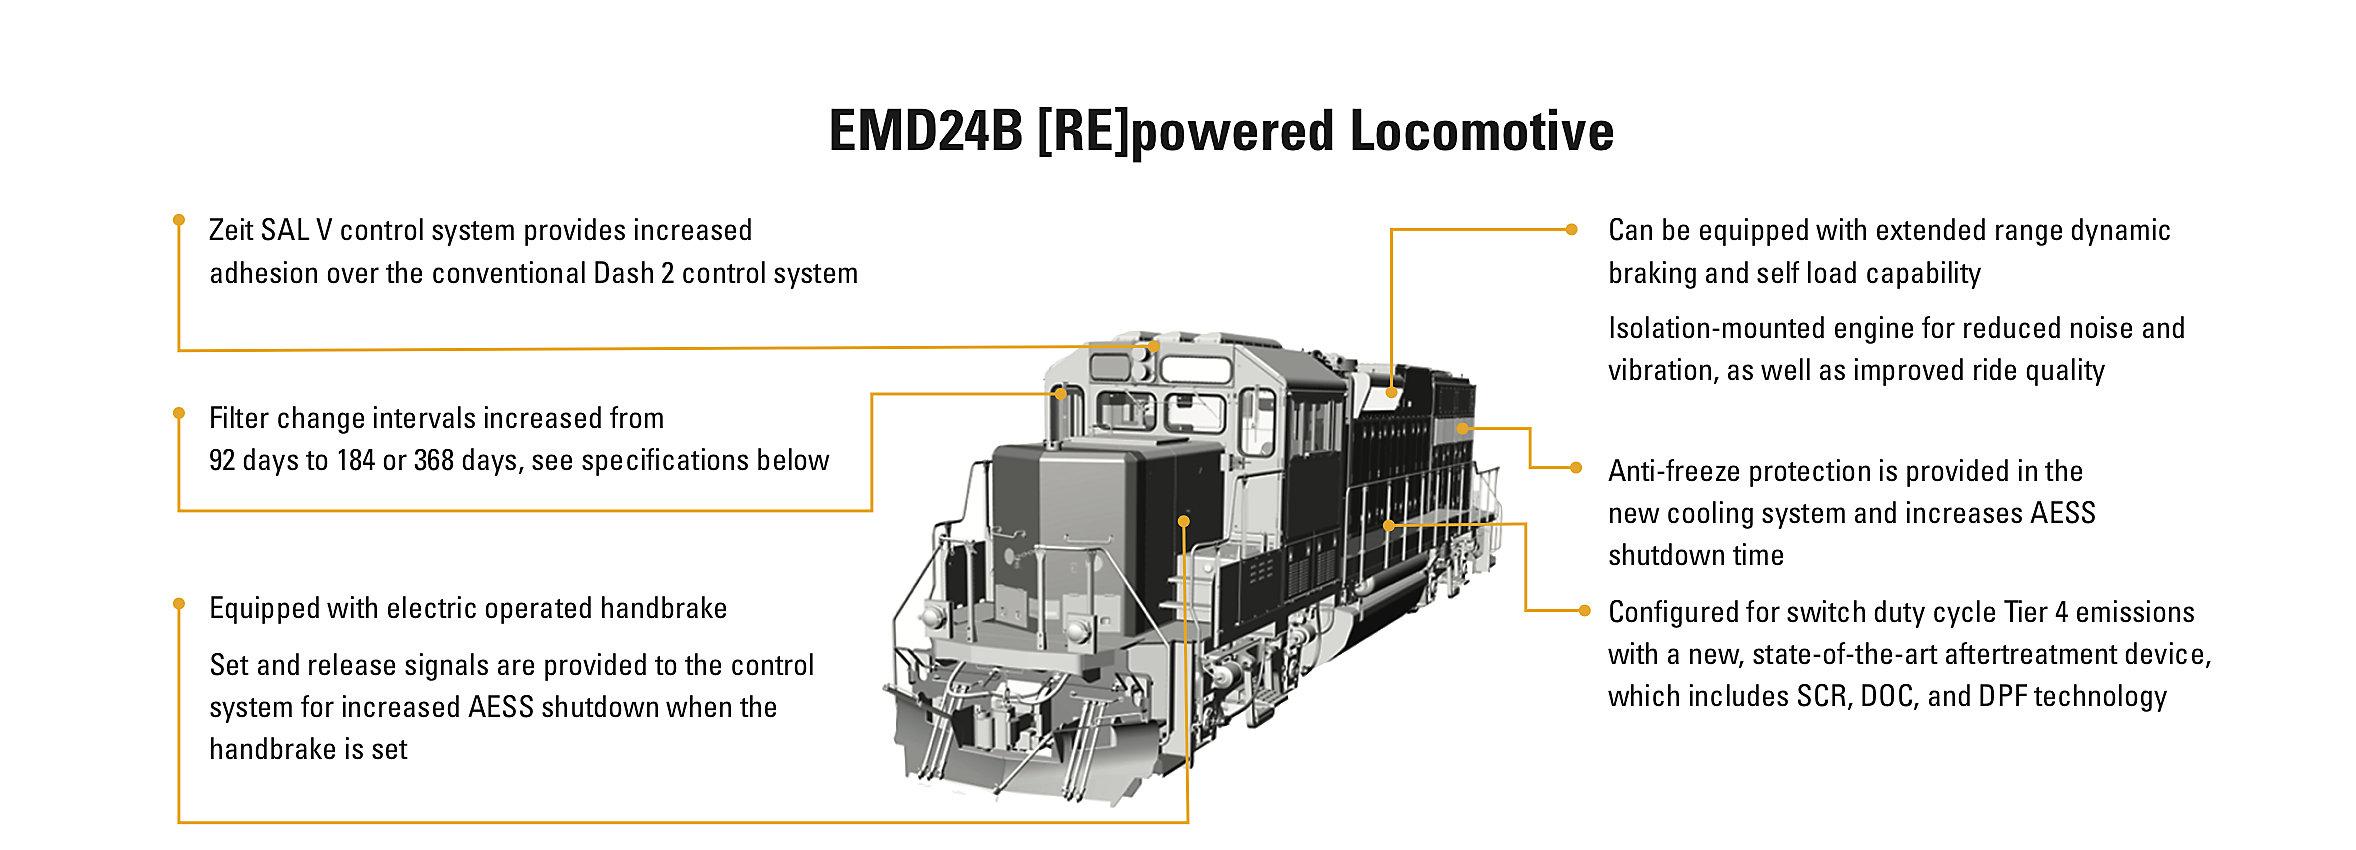 EMD® 24B Repowered Locomotive